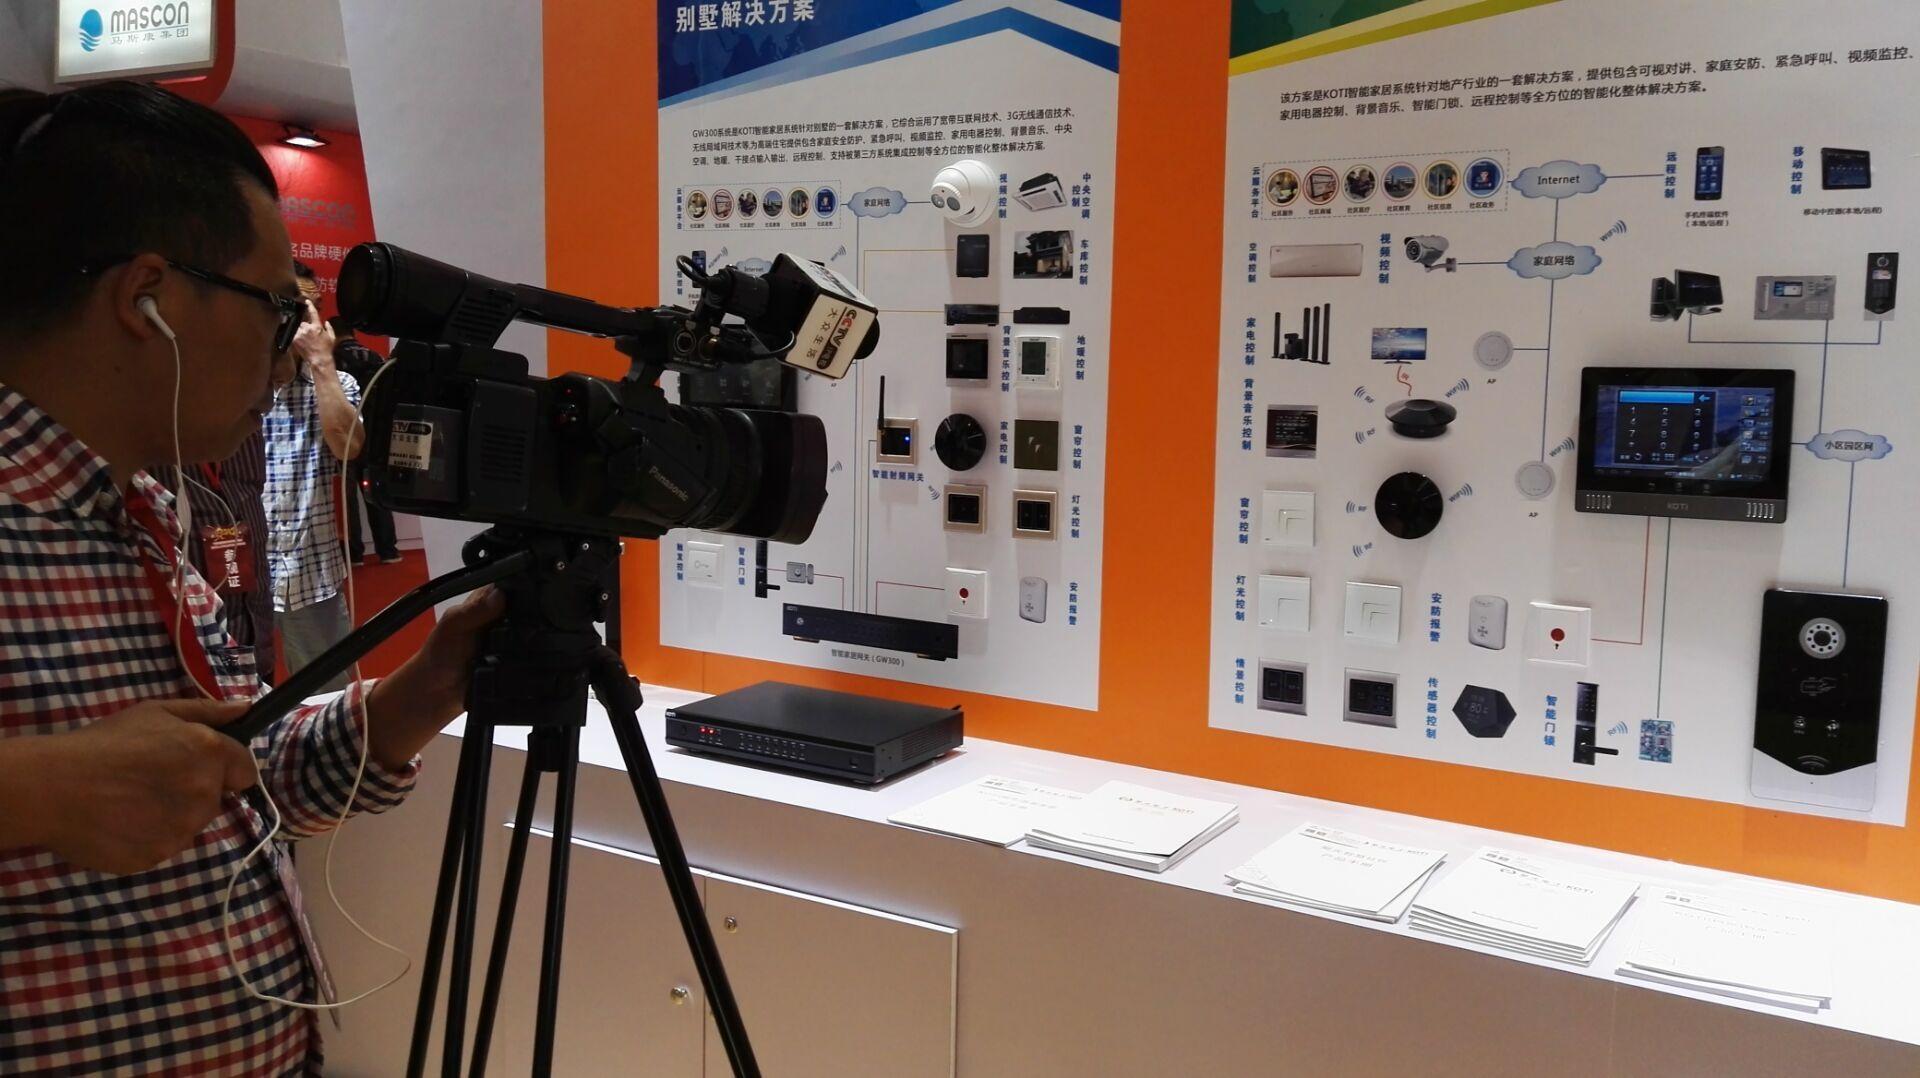 CCTV品牌栏目现场拍摄KOTI产品